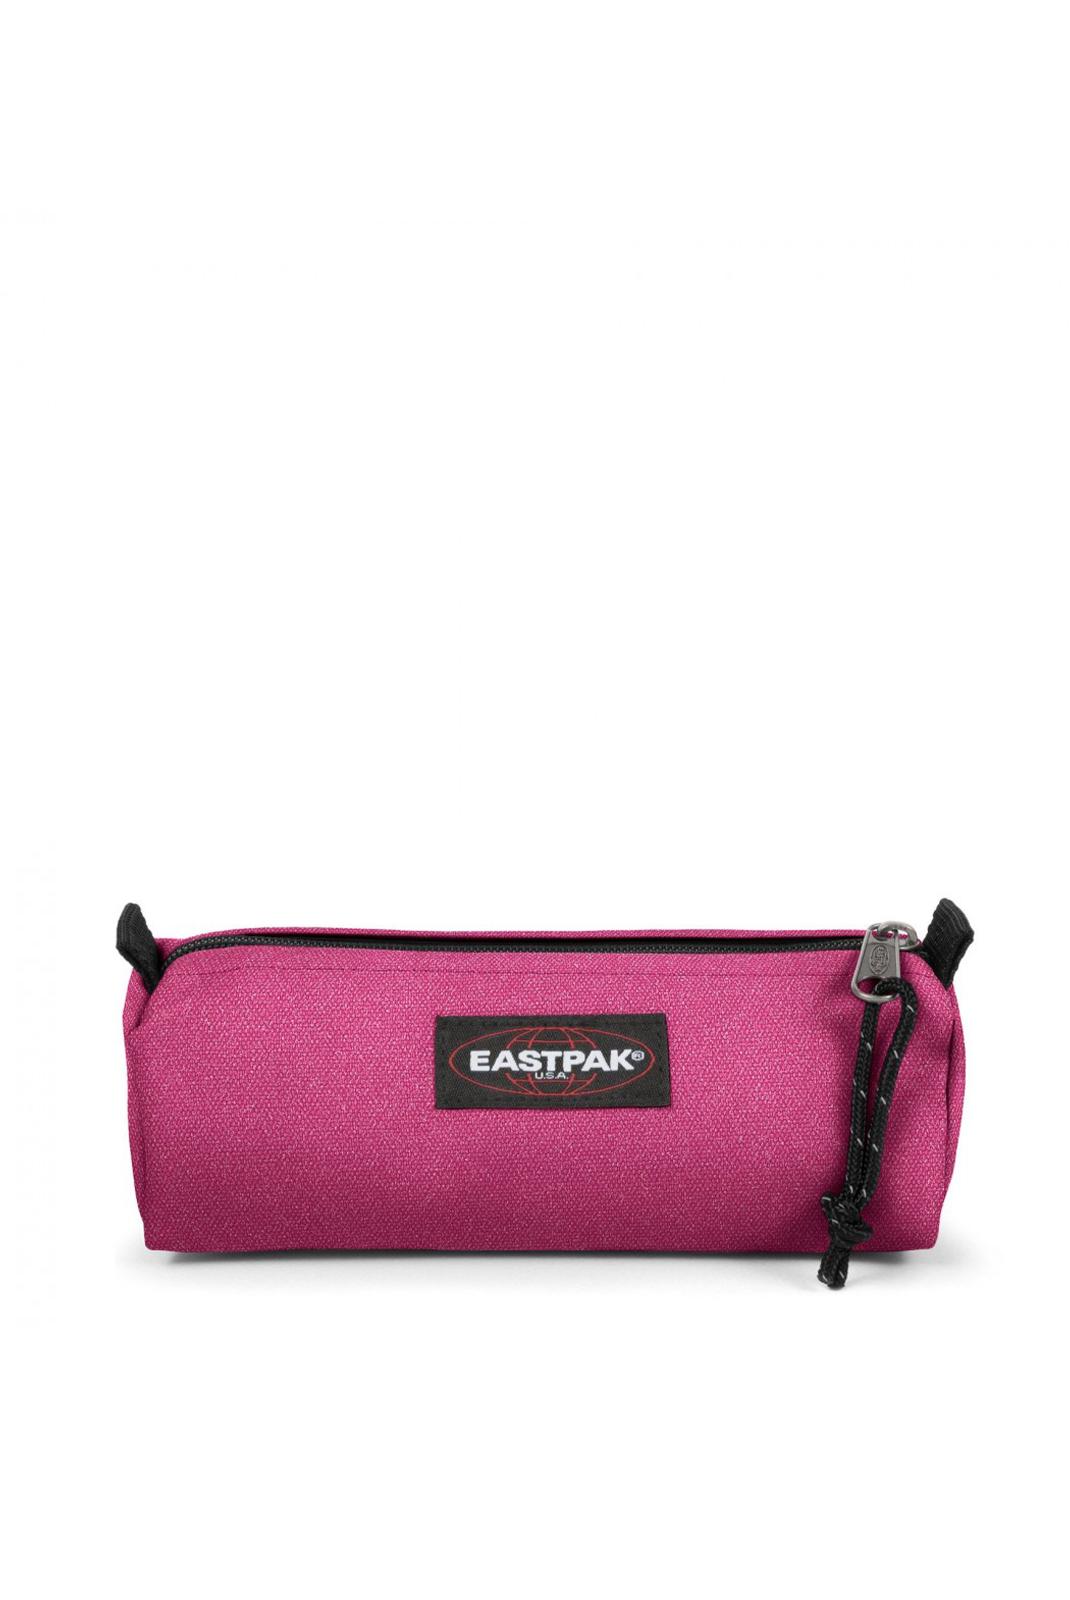 Etuis / Trousses  Eastpak EK372C29 C29 Spark Pink